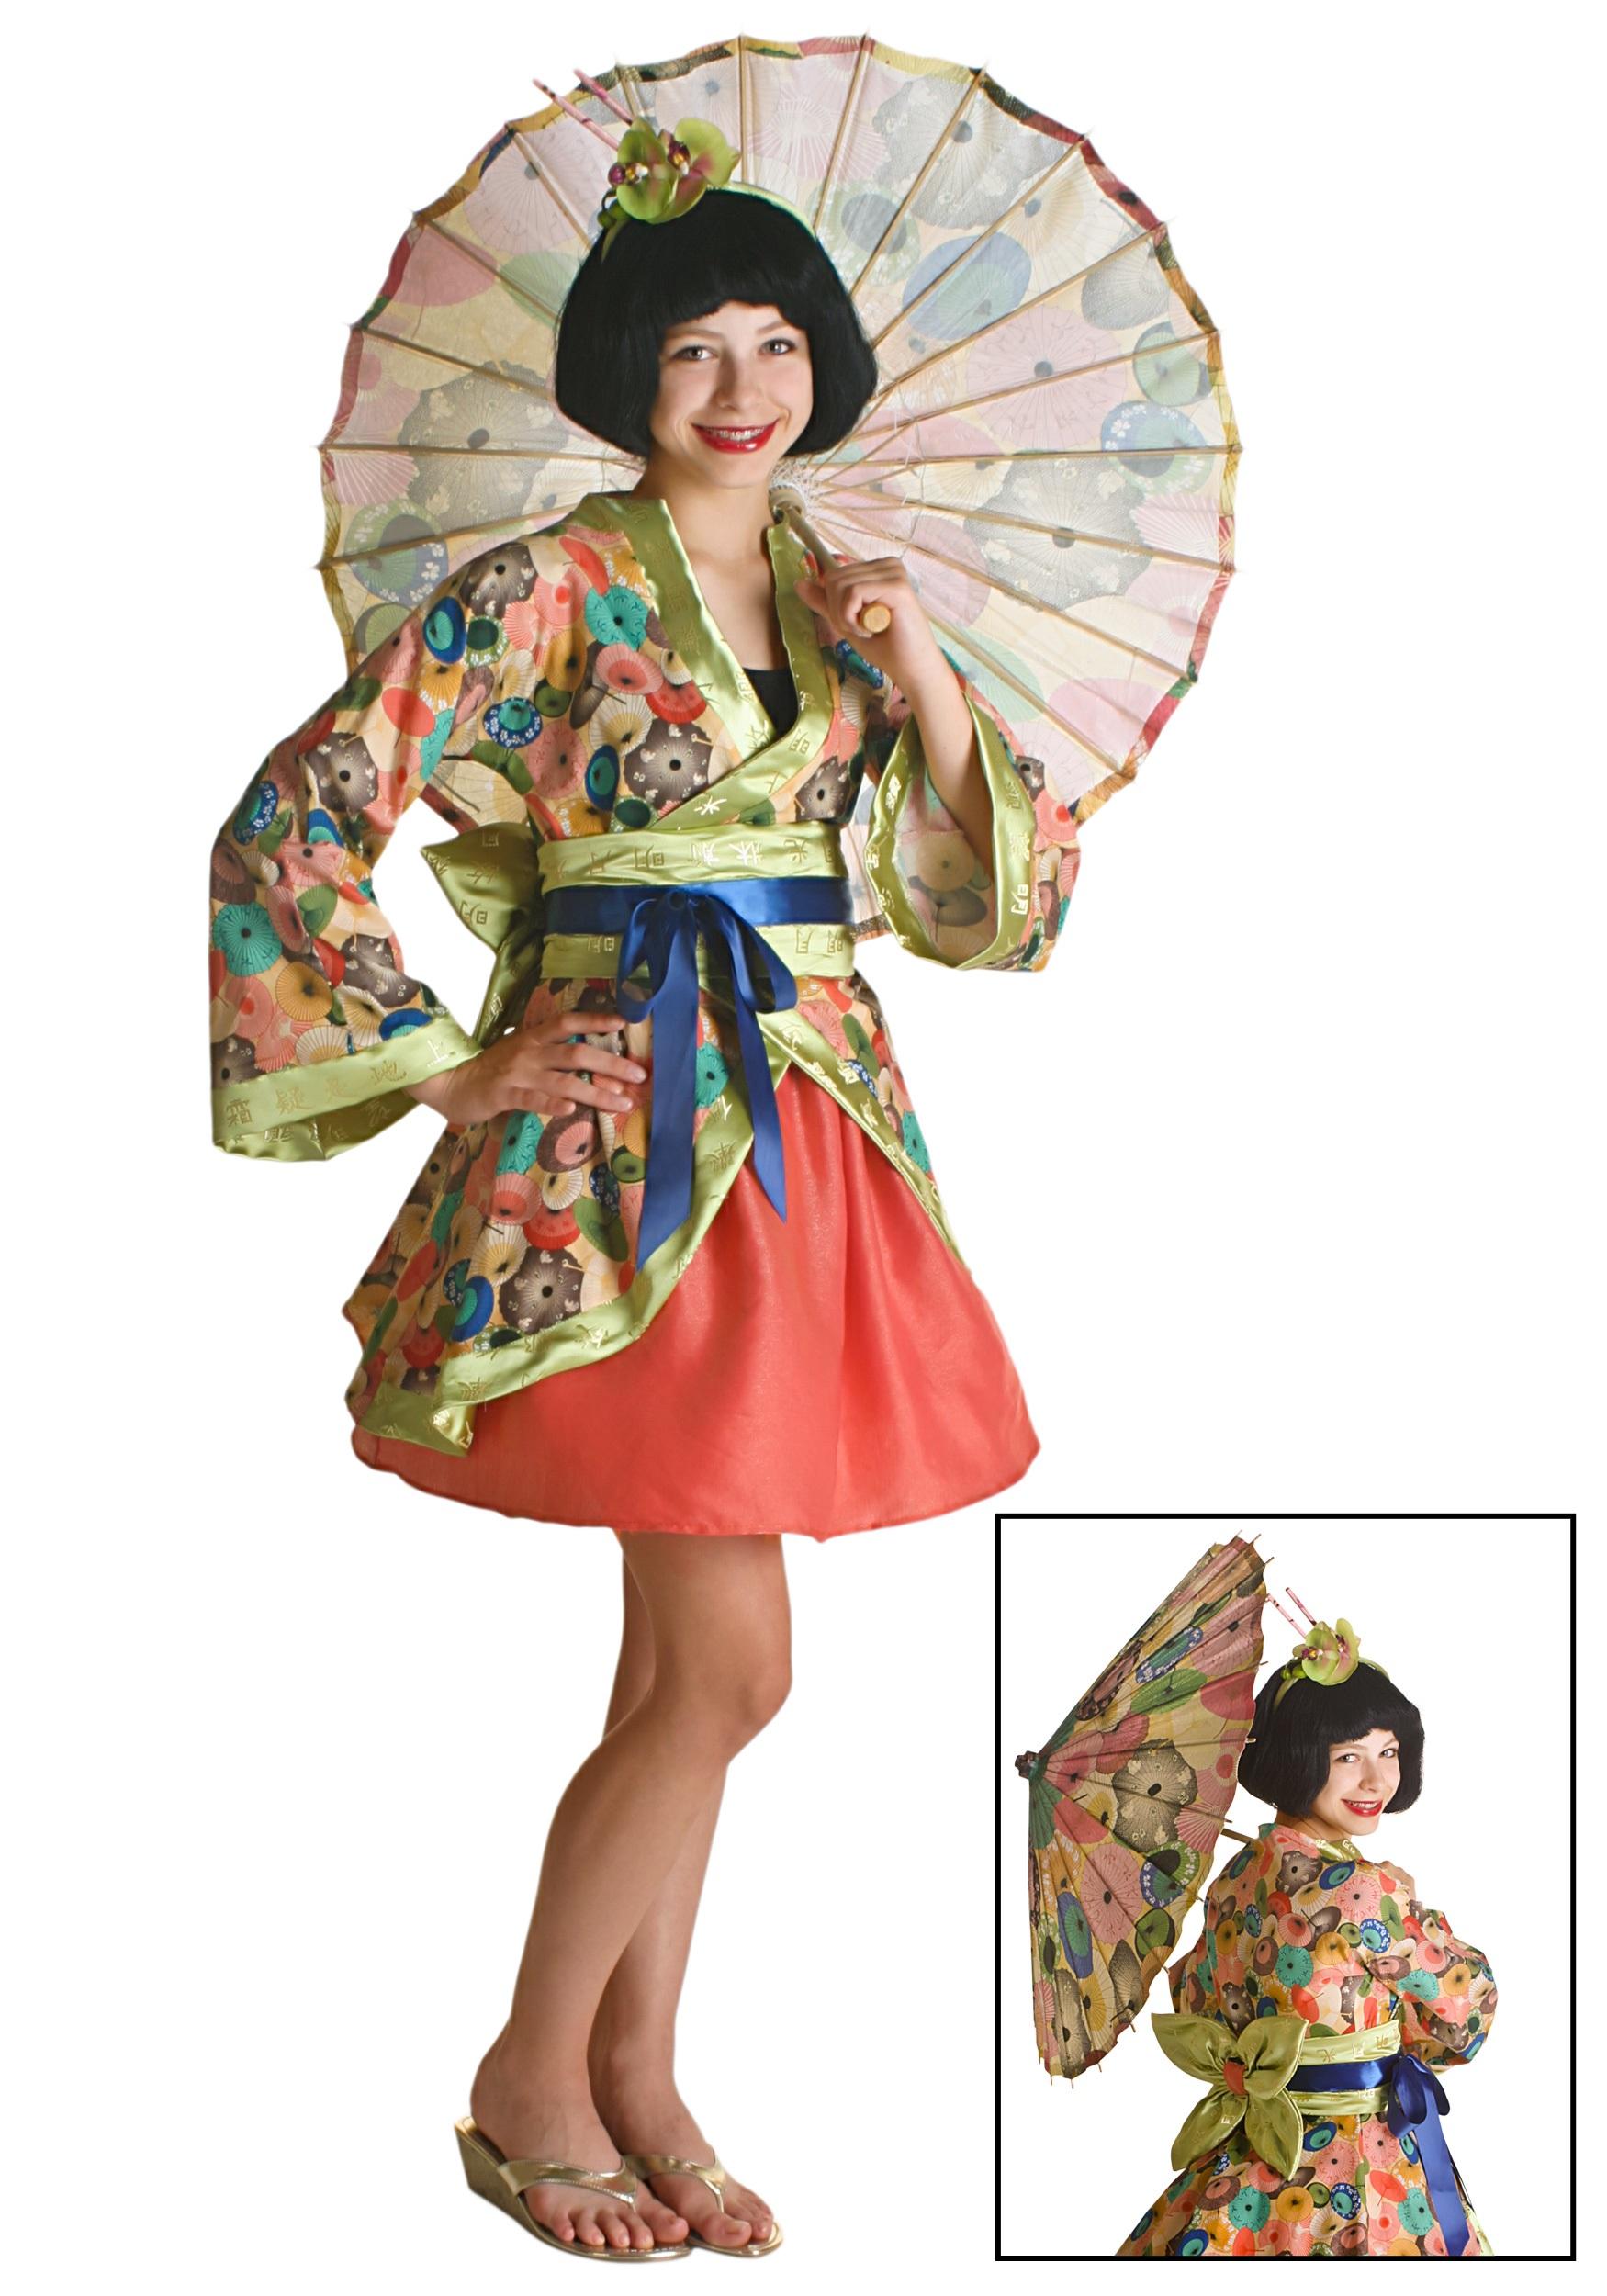 Fashion nova is selling a geisha halloween costume